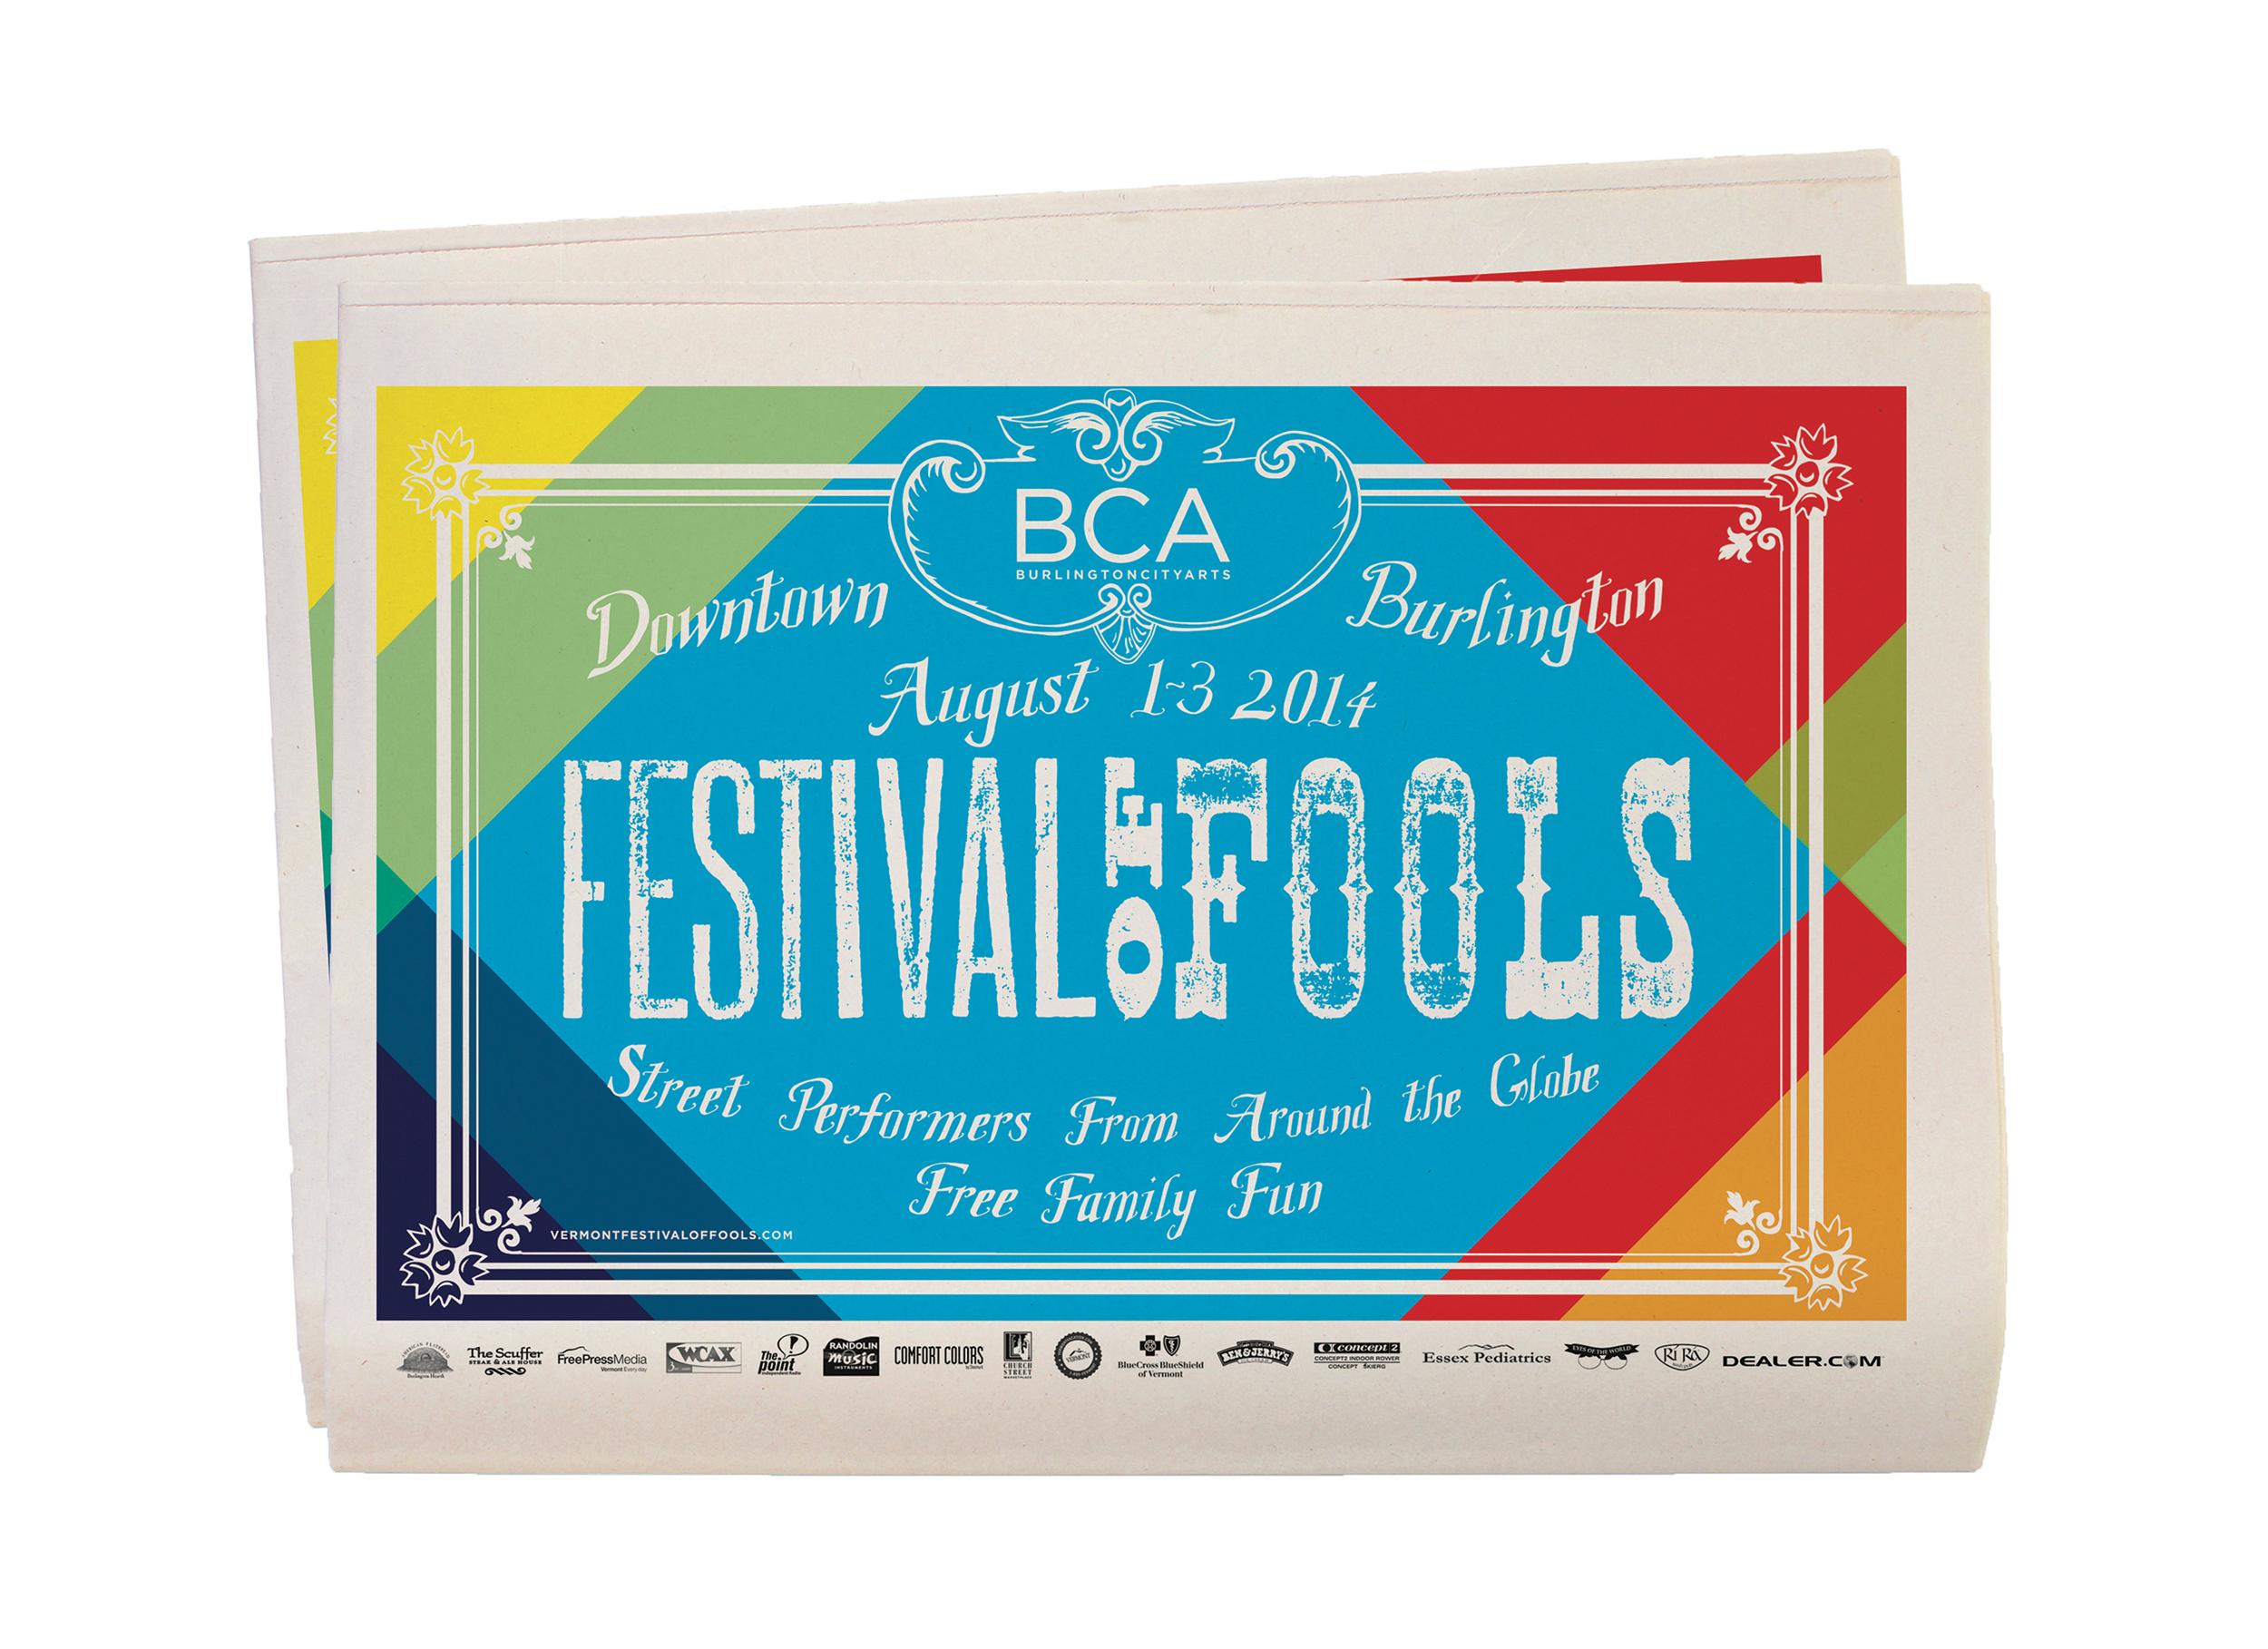 FestivalofFoolsNewspaperAdweb.jpg